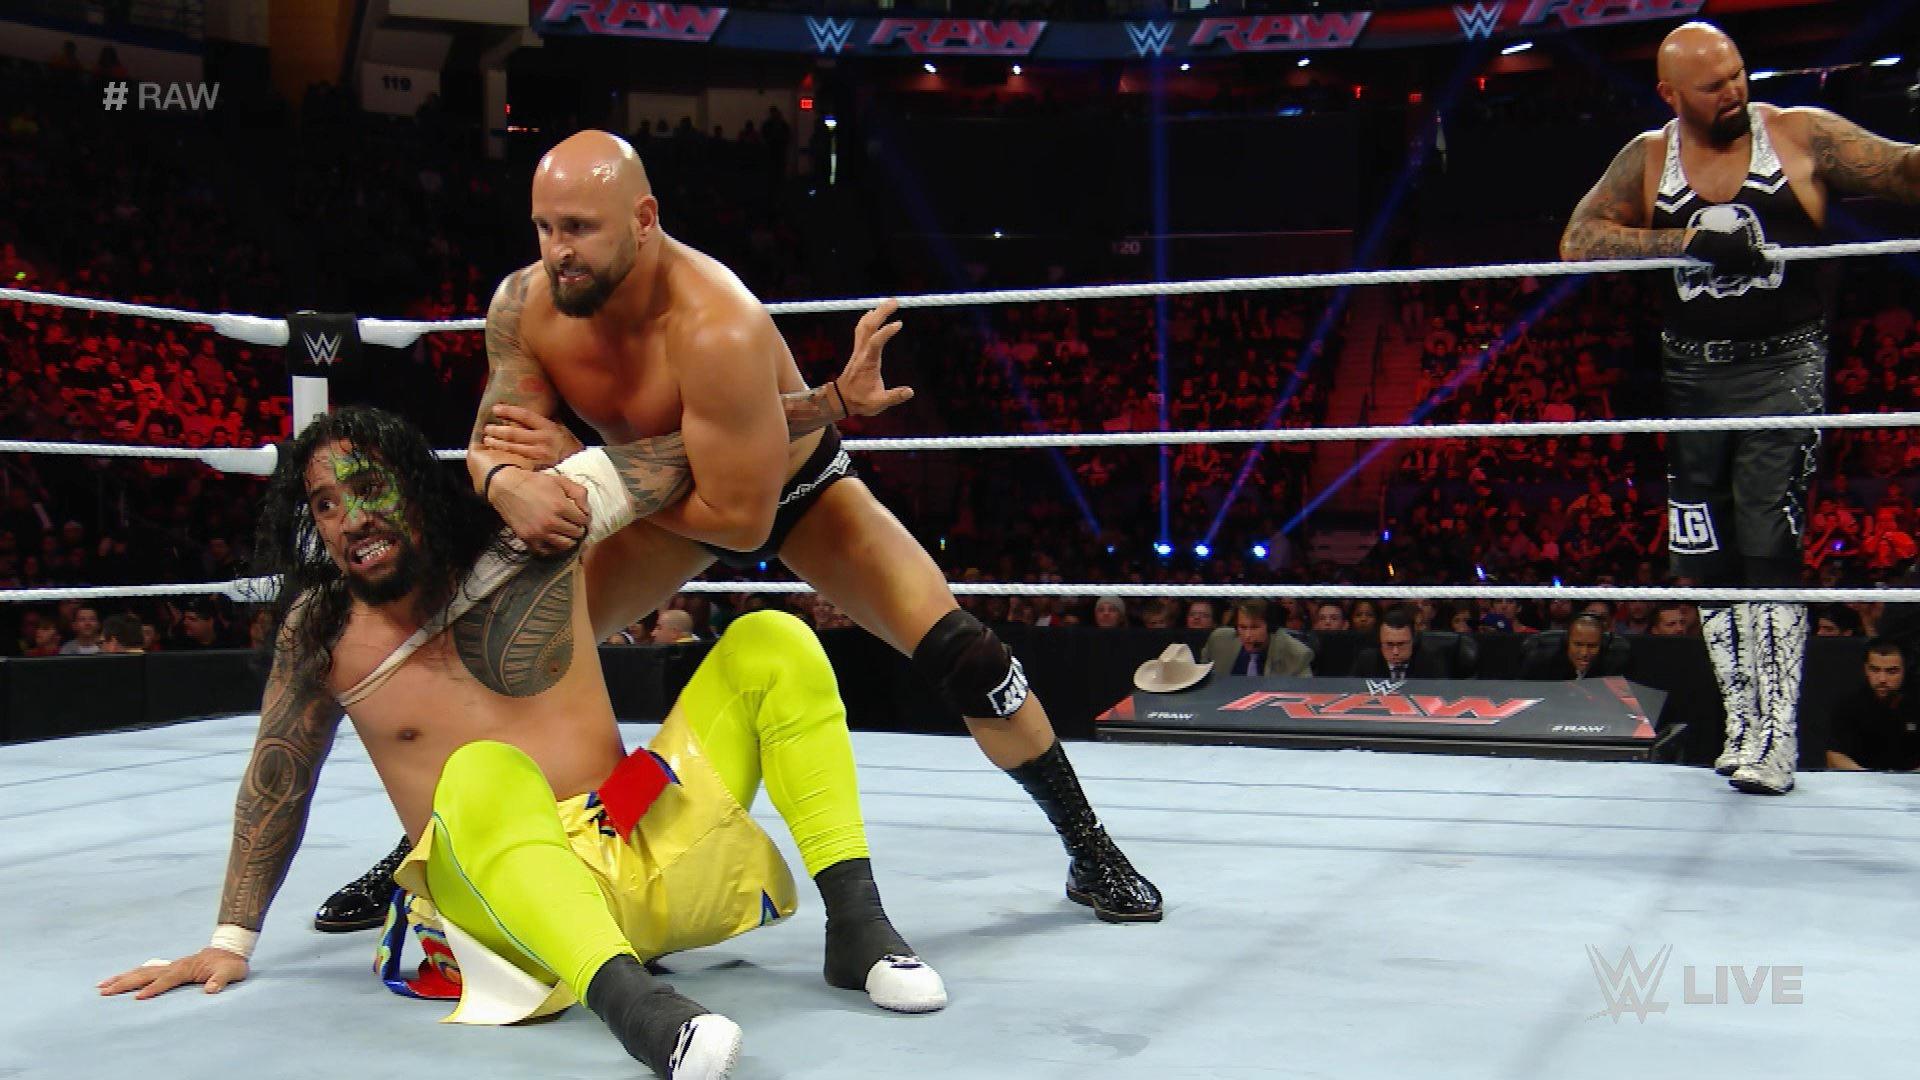 Resultat WWE RAW 25 avril